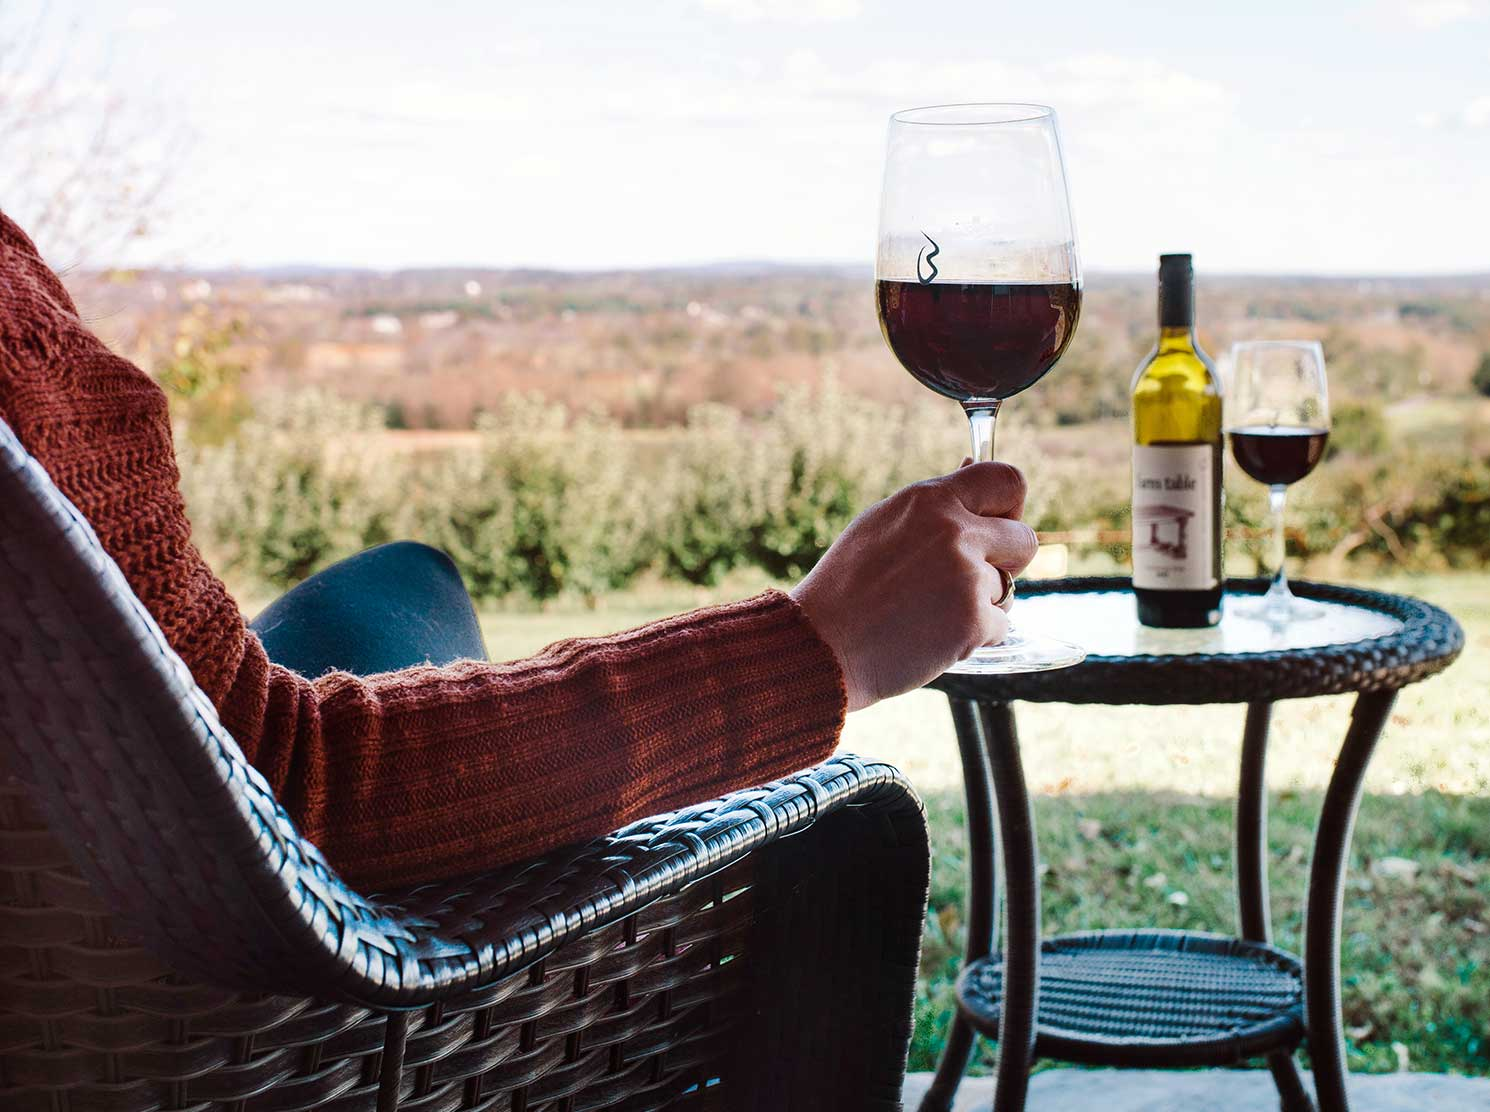 Woman enjoying glass of red wine on patio